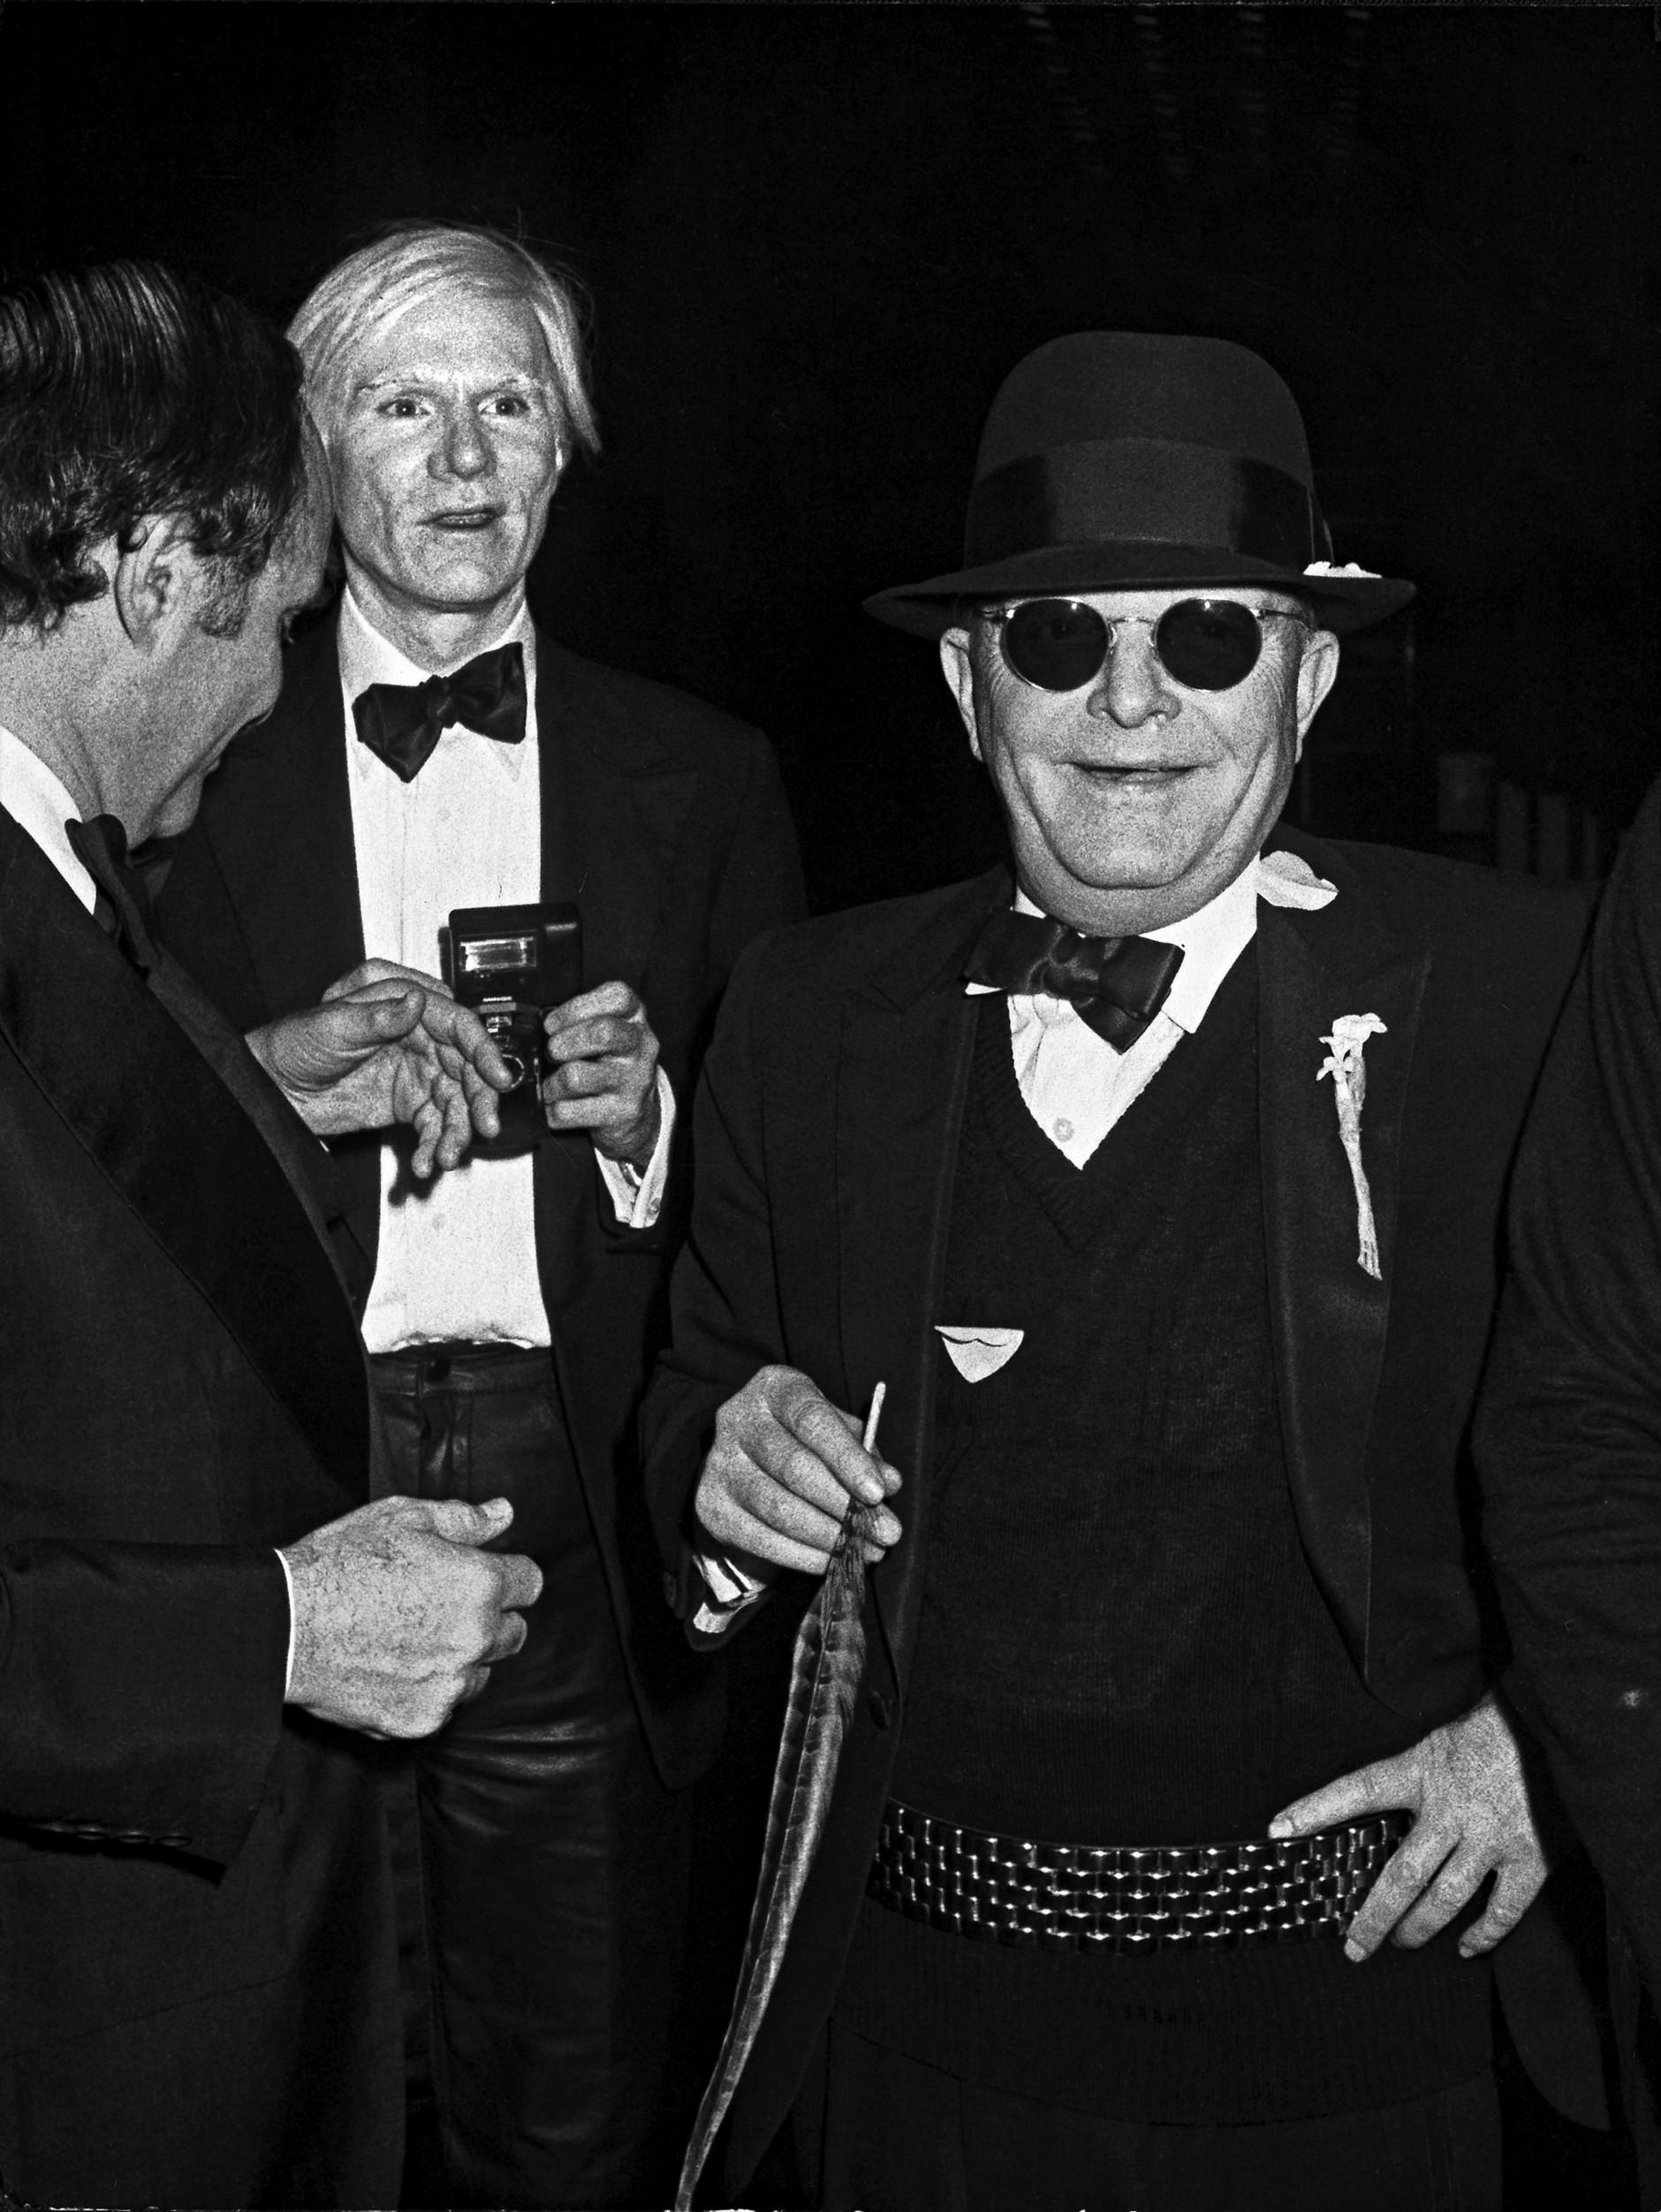 Ron Galella: Lester Persky, Andy Warhol and Truman Capote, New York, December 1978. © Ron Galella, Ltd.